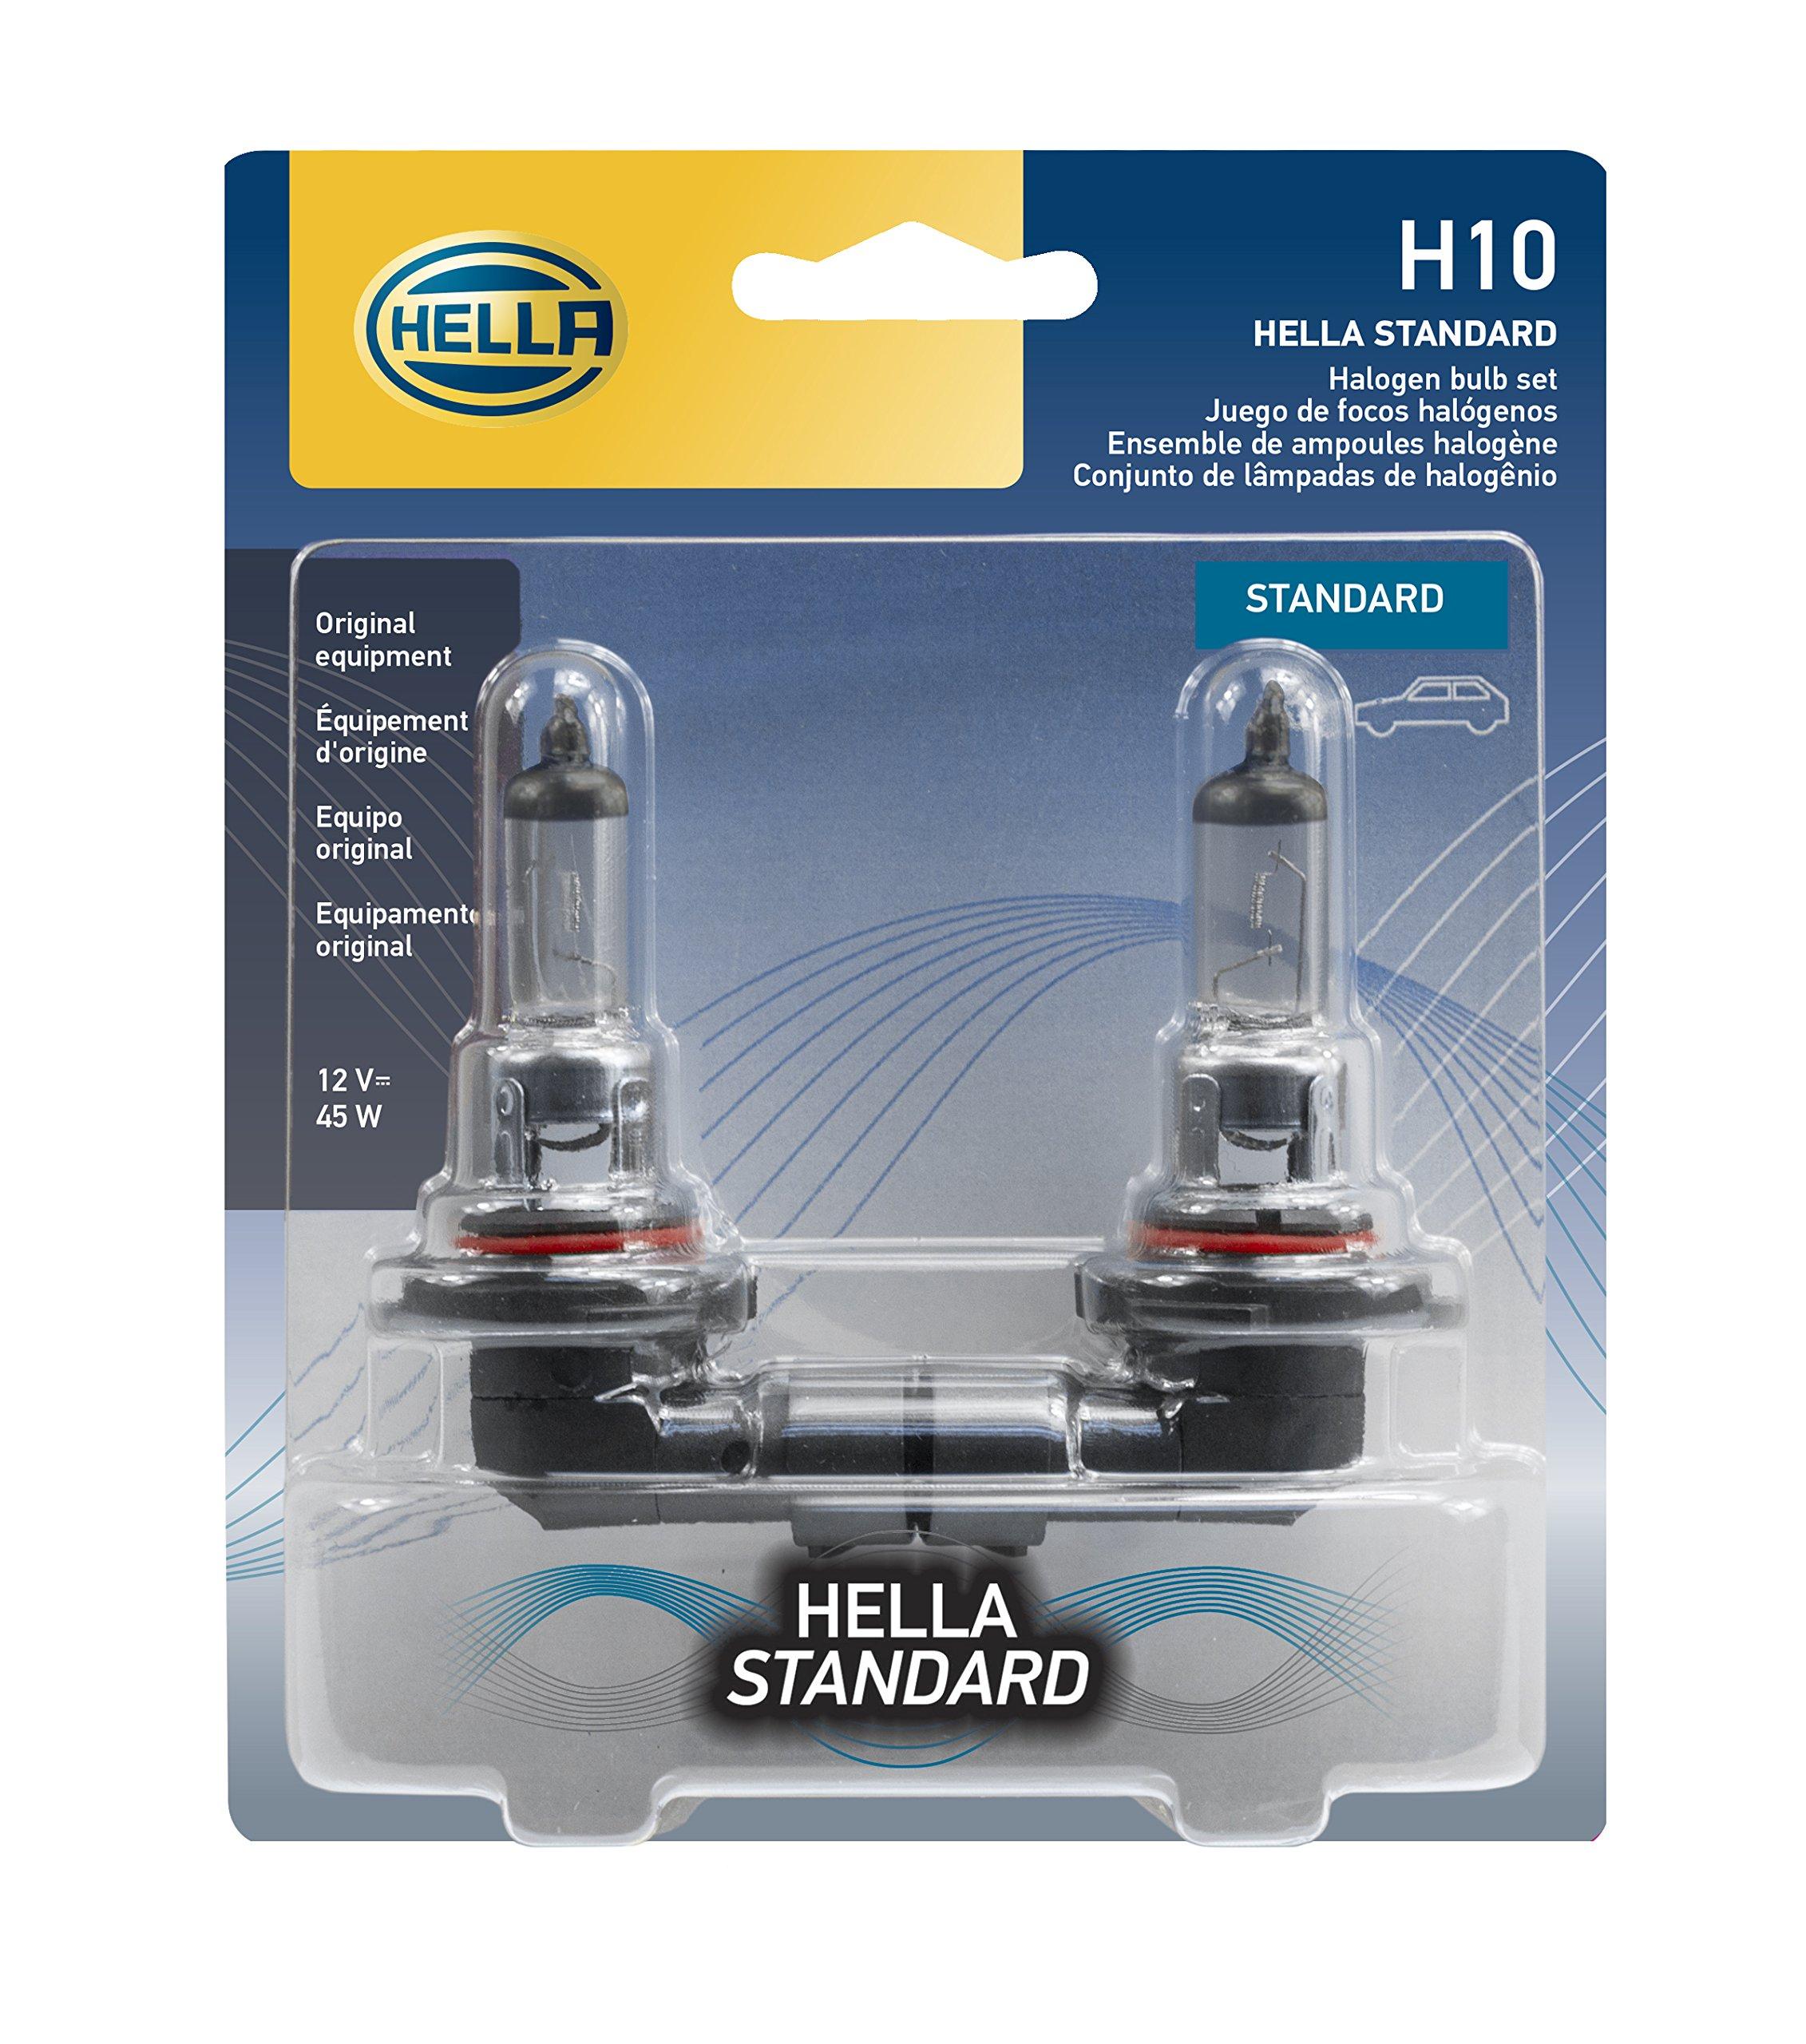 HELLA H10TB Standard-45W Halogen 9145 Bulbs, 12 V, 2 Pack